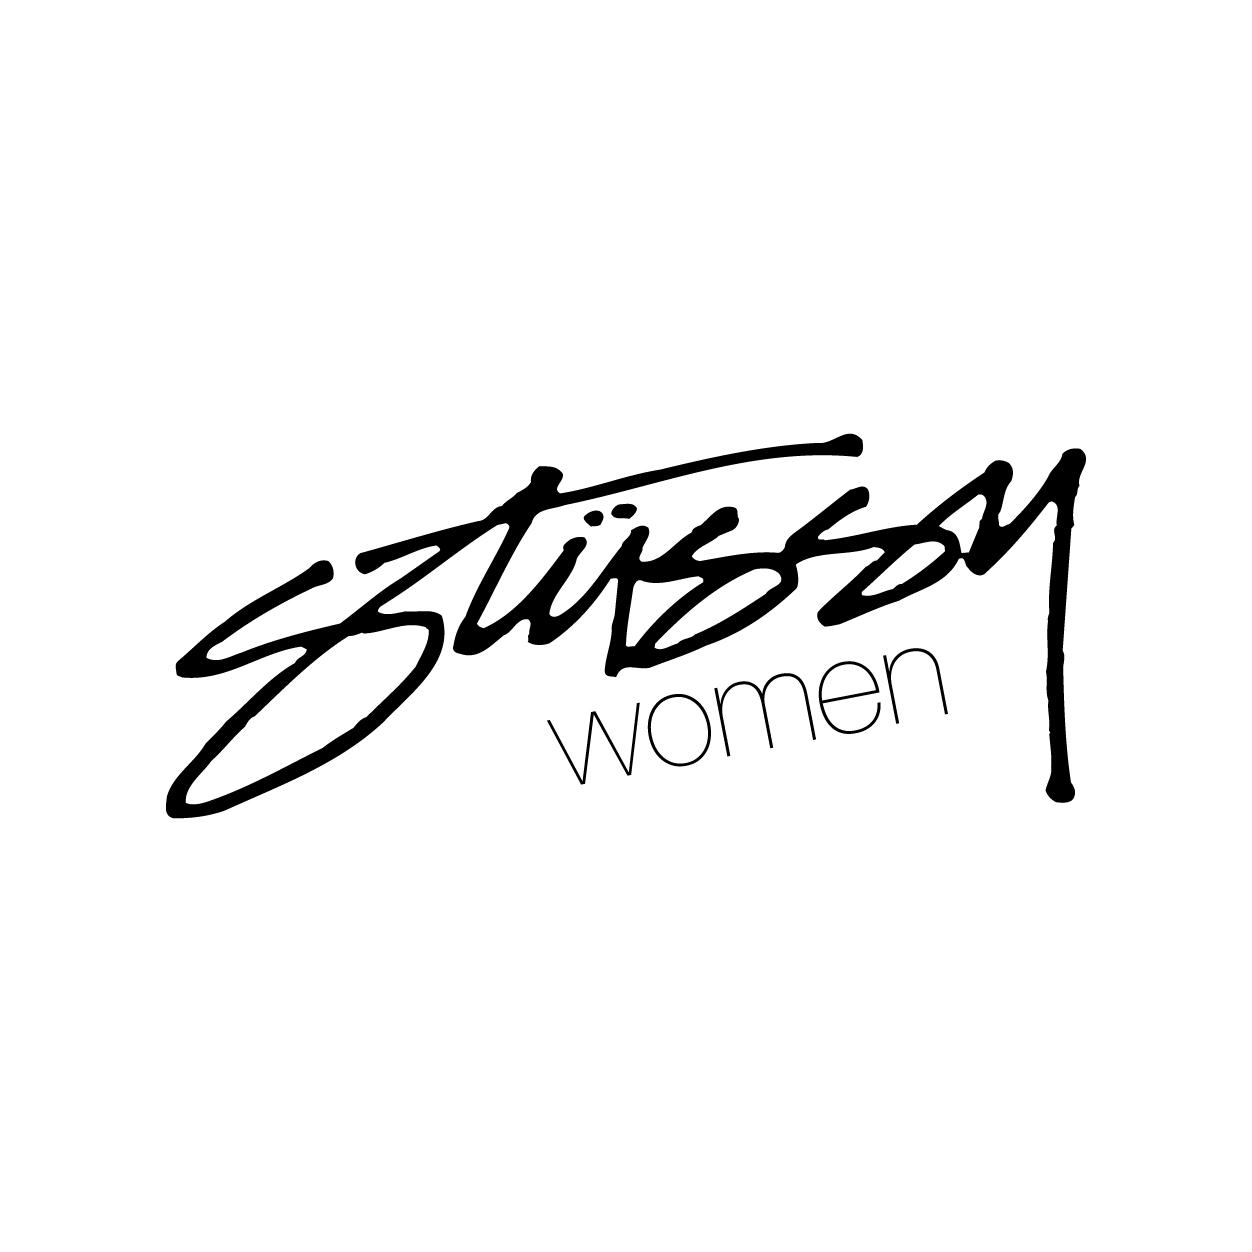 Stussy Women Logo 2-01